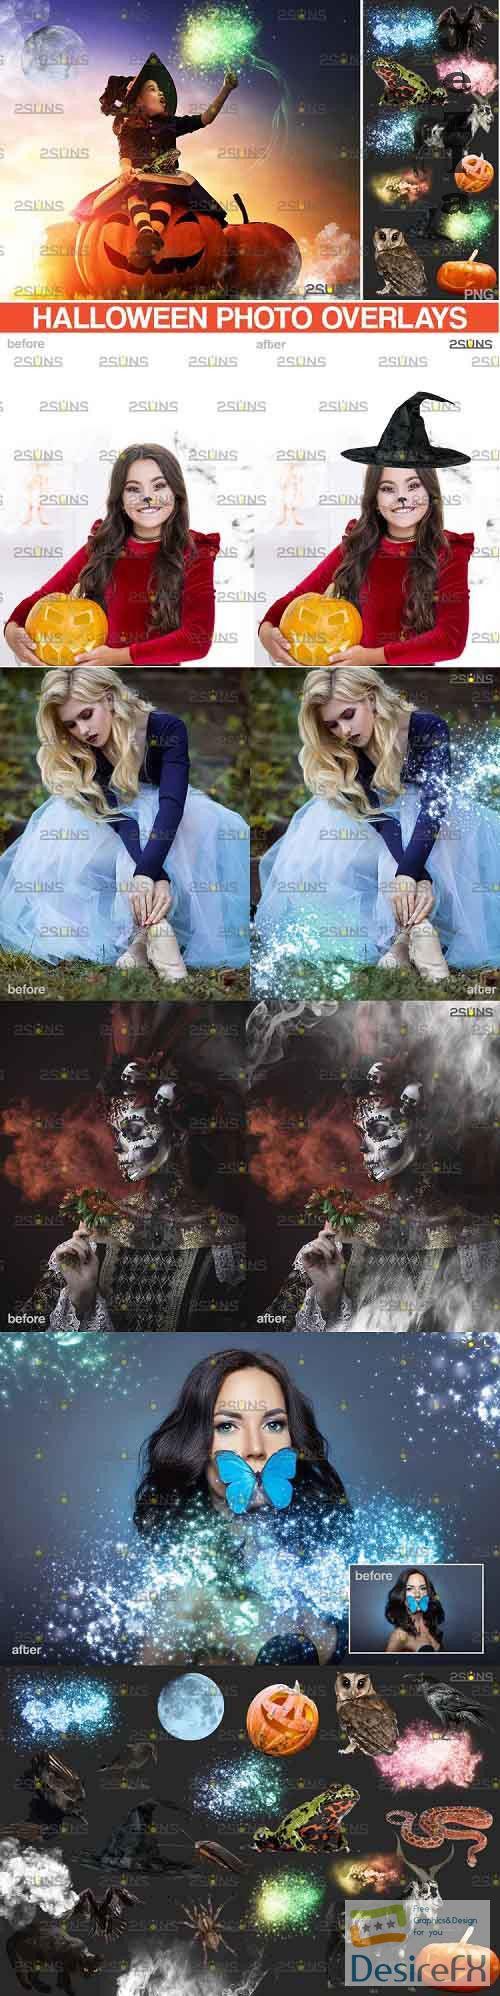 Magic sparks, Photoshop overlay, photo overlays magic wand - 895354